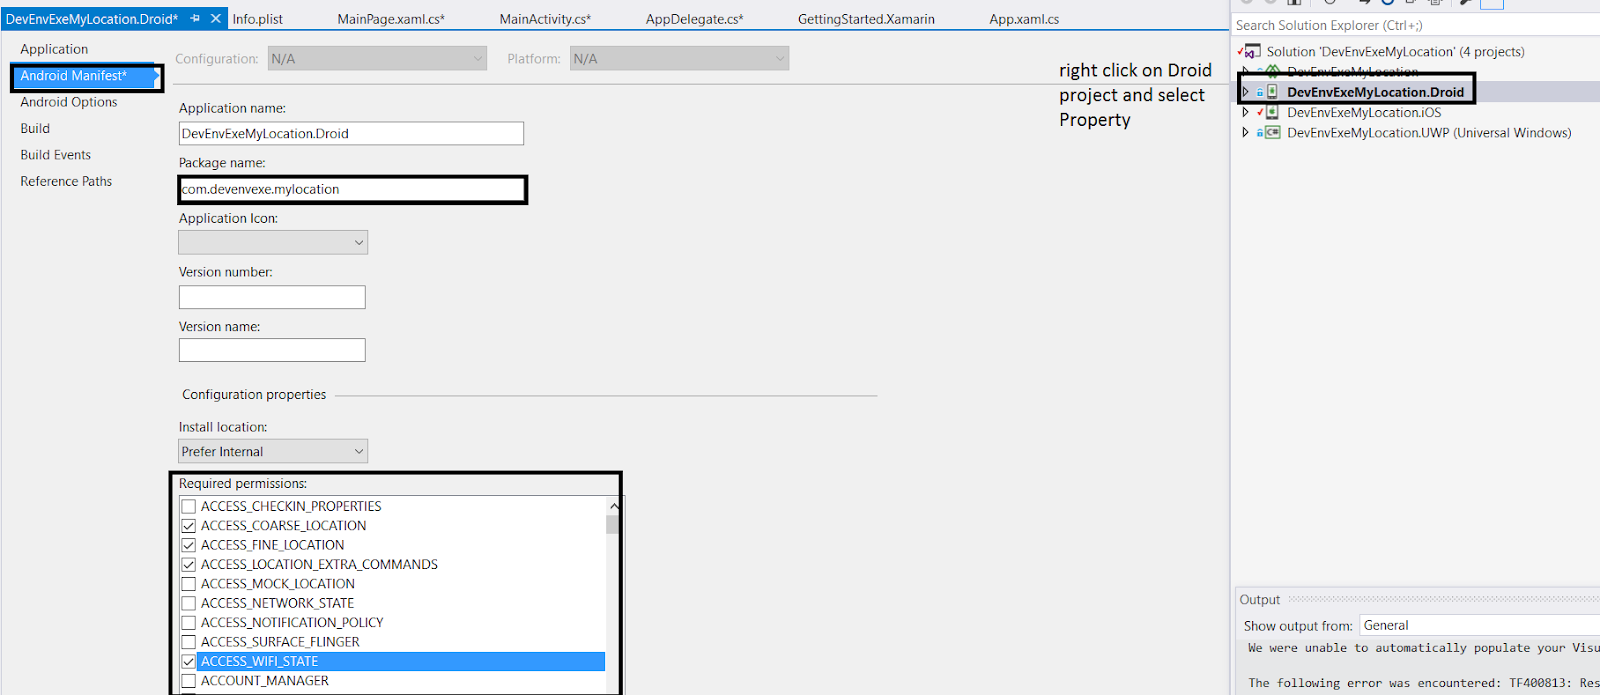 DevEnvExe Com/Xamarin: Generate Google API Key for Xamarin